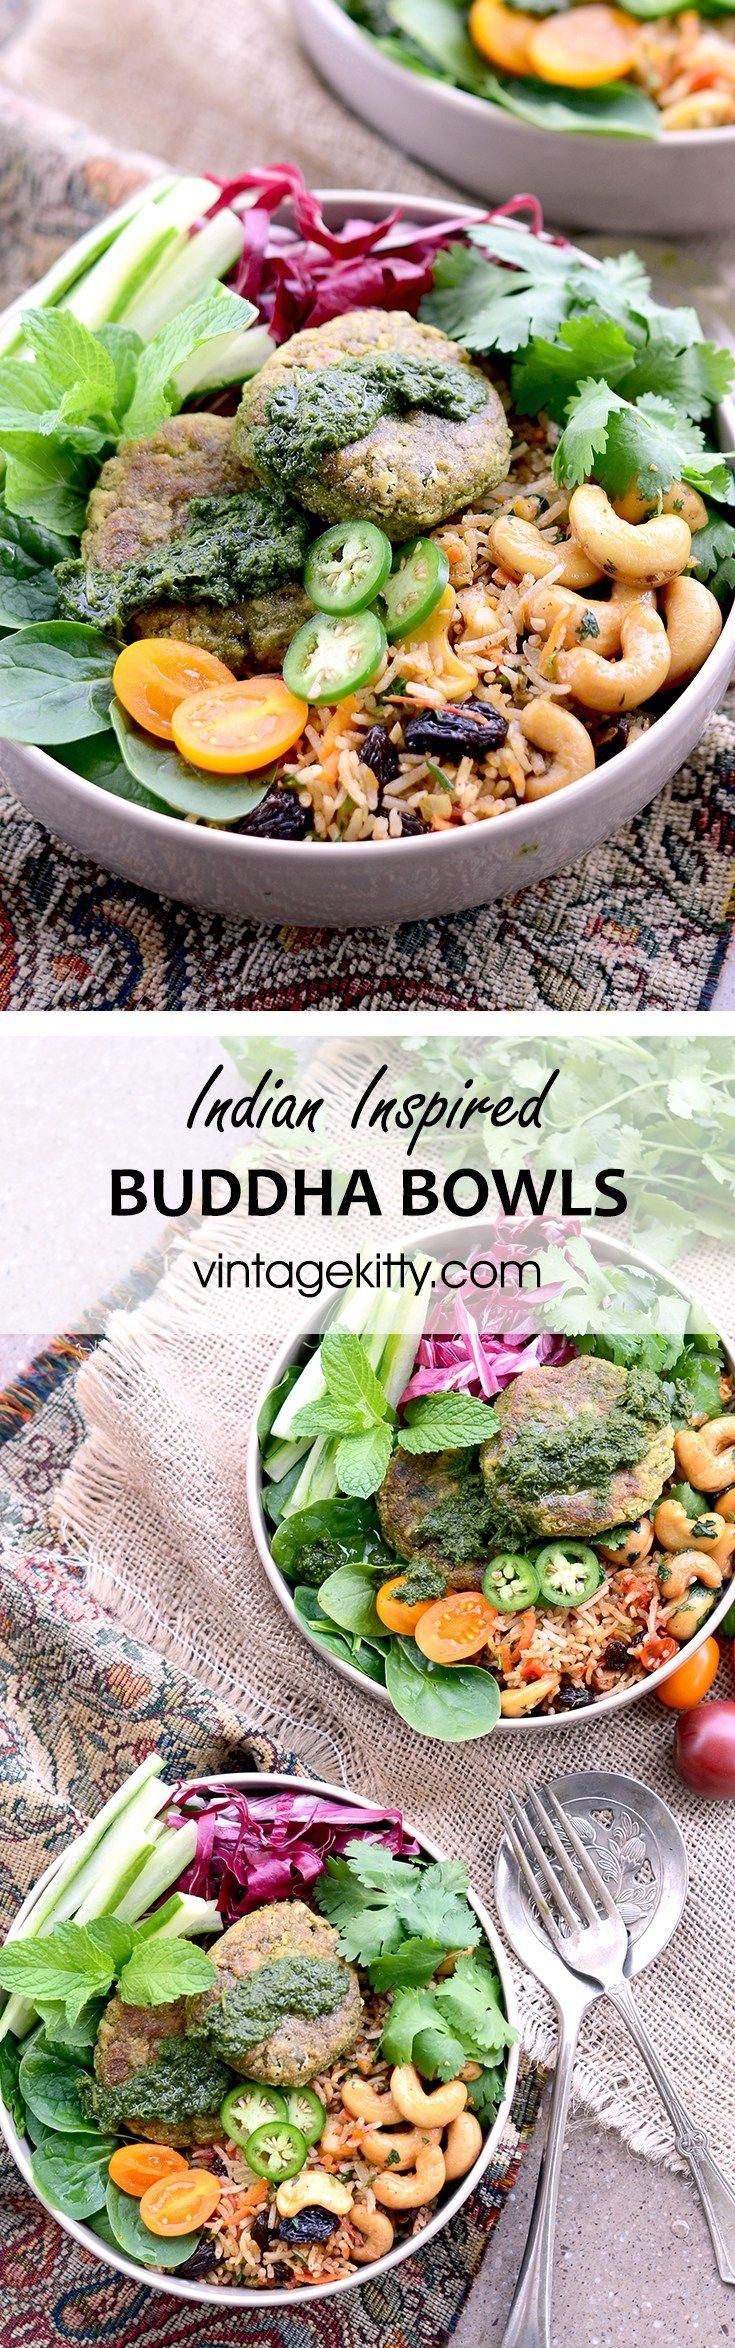 Indian Inspired Buddha Bowl Recipe Indian food recipes